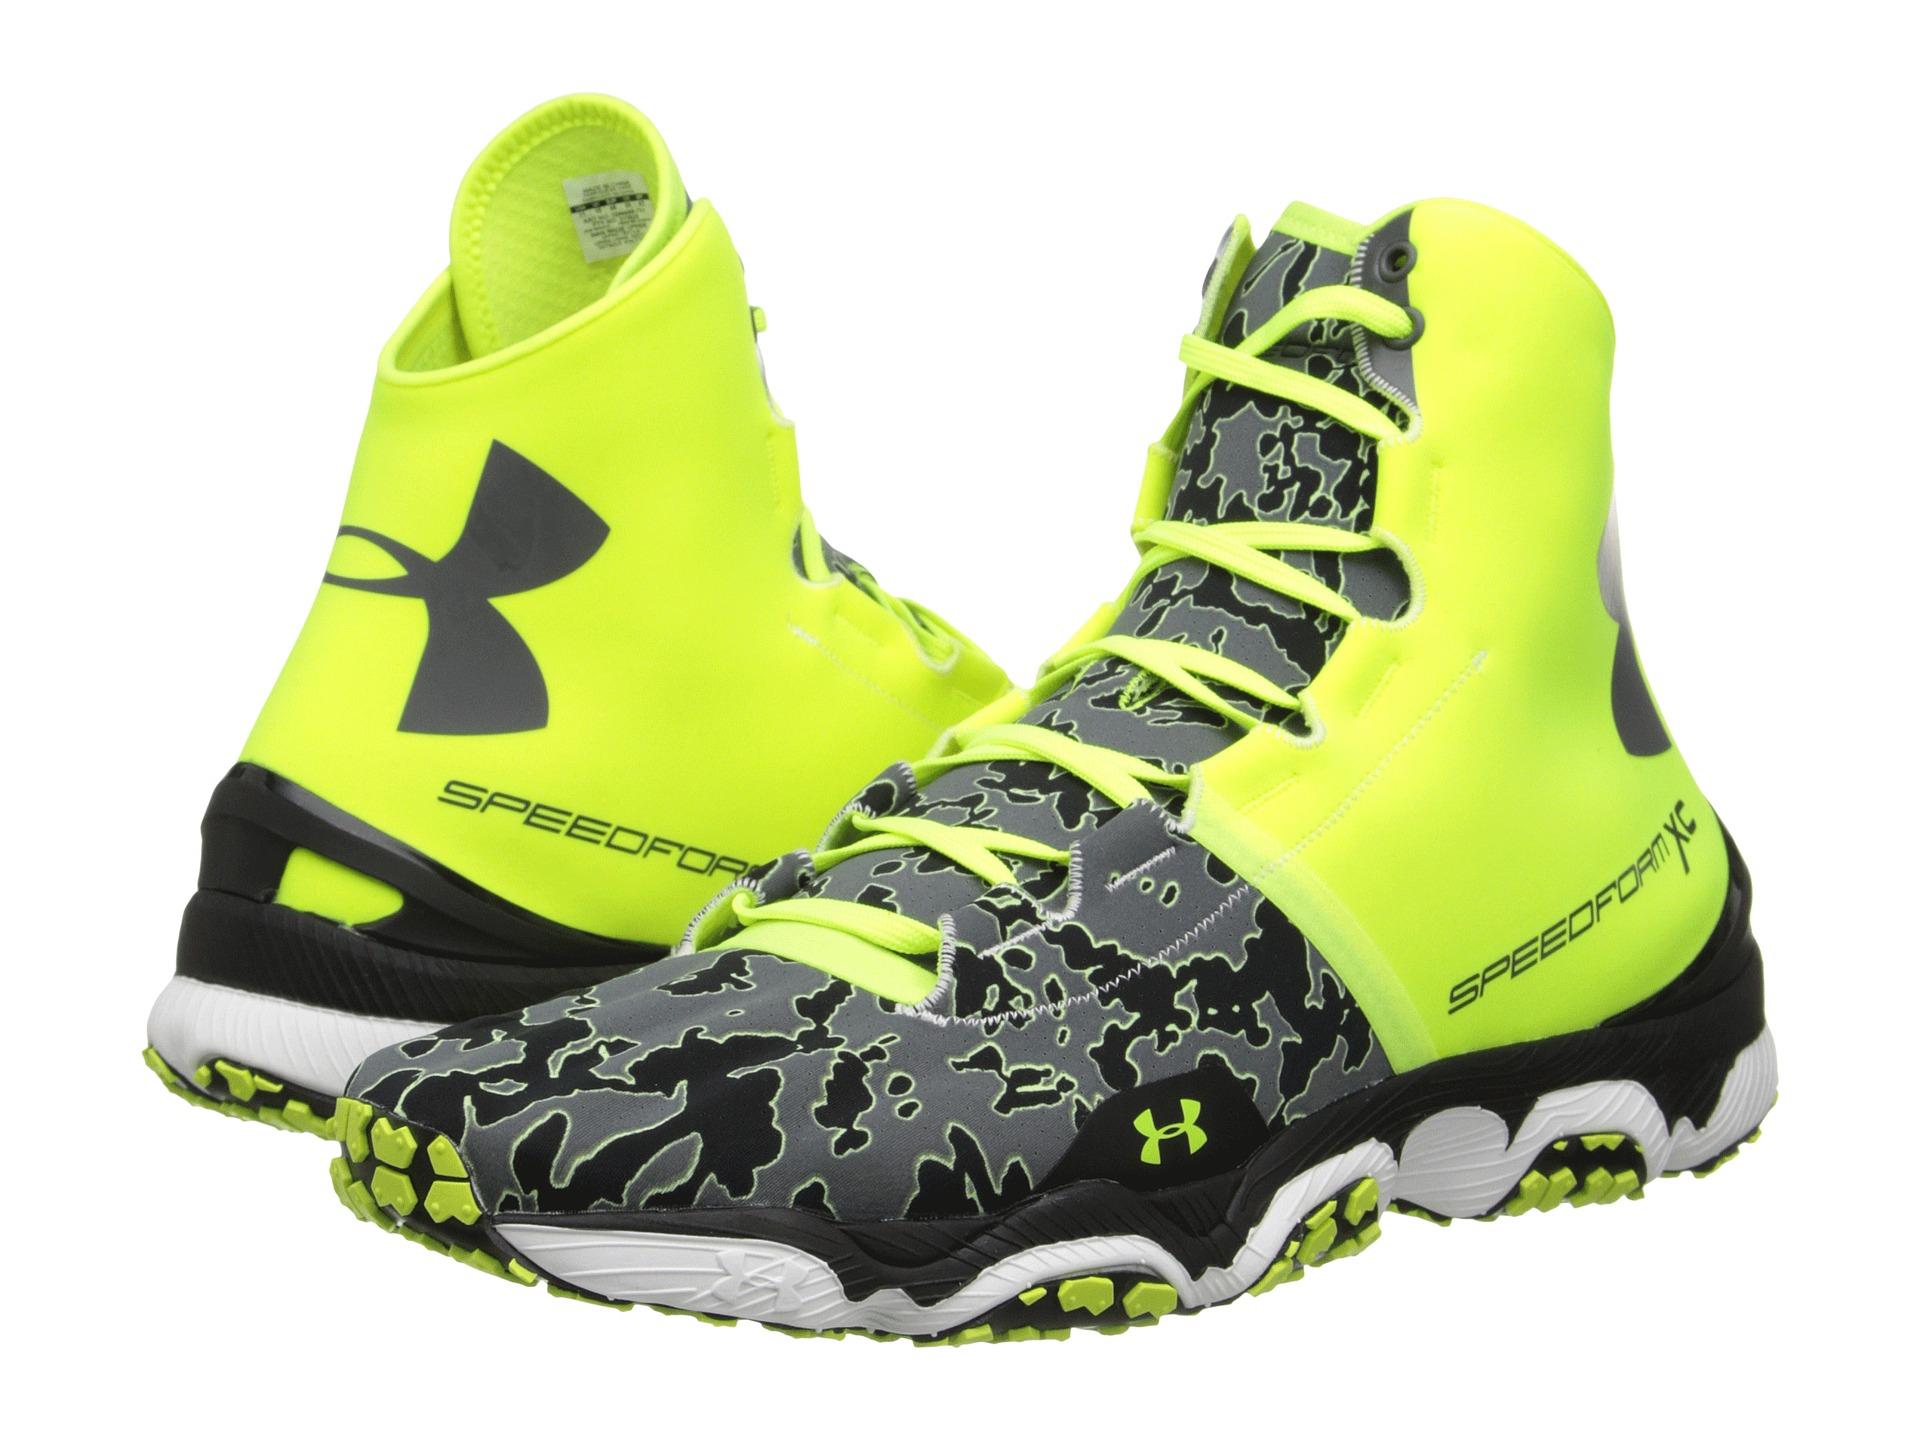 Lyst - Under Armour Ua Speedform Xc Mid in Yellow for Men 619982685